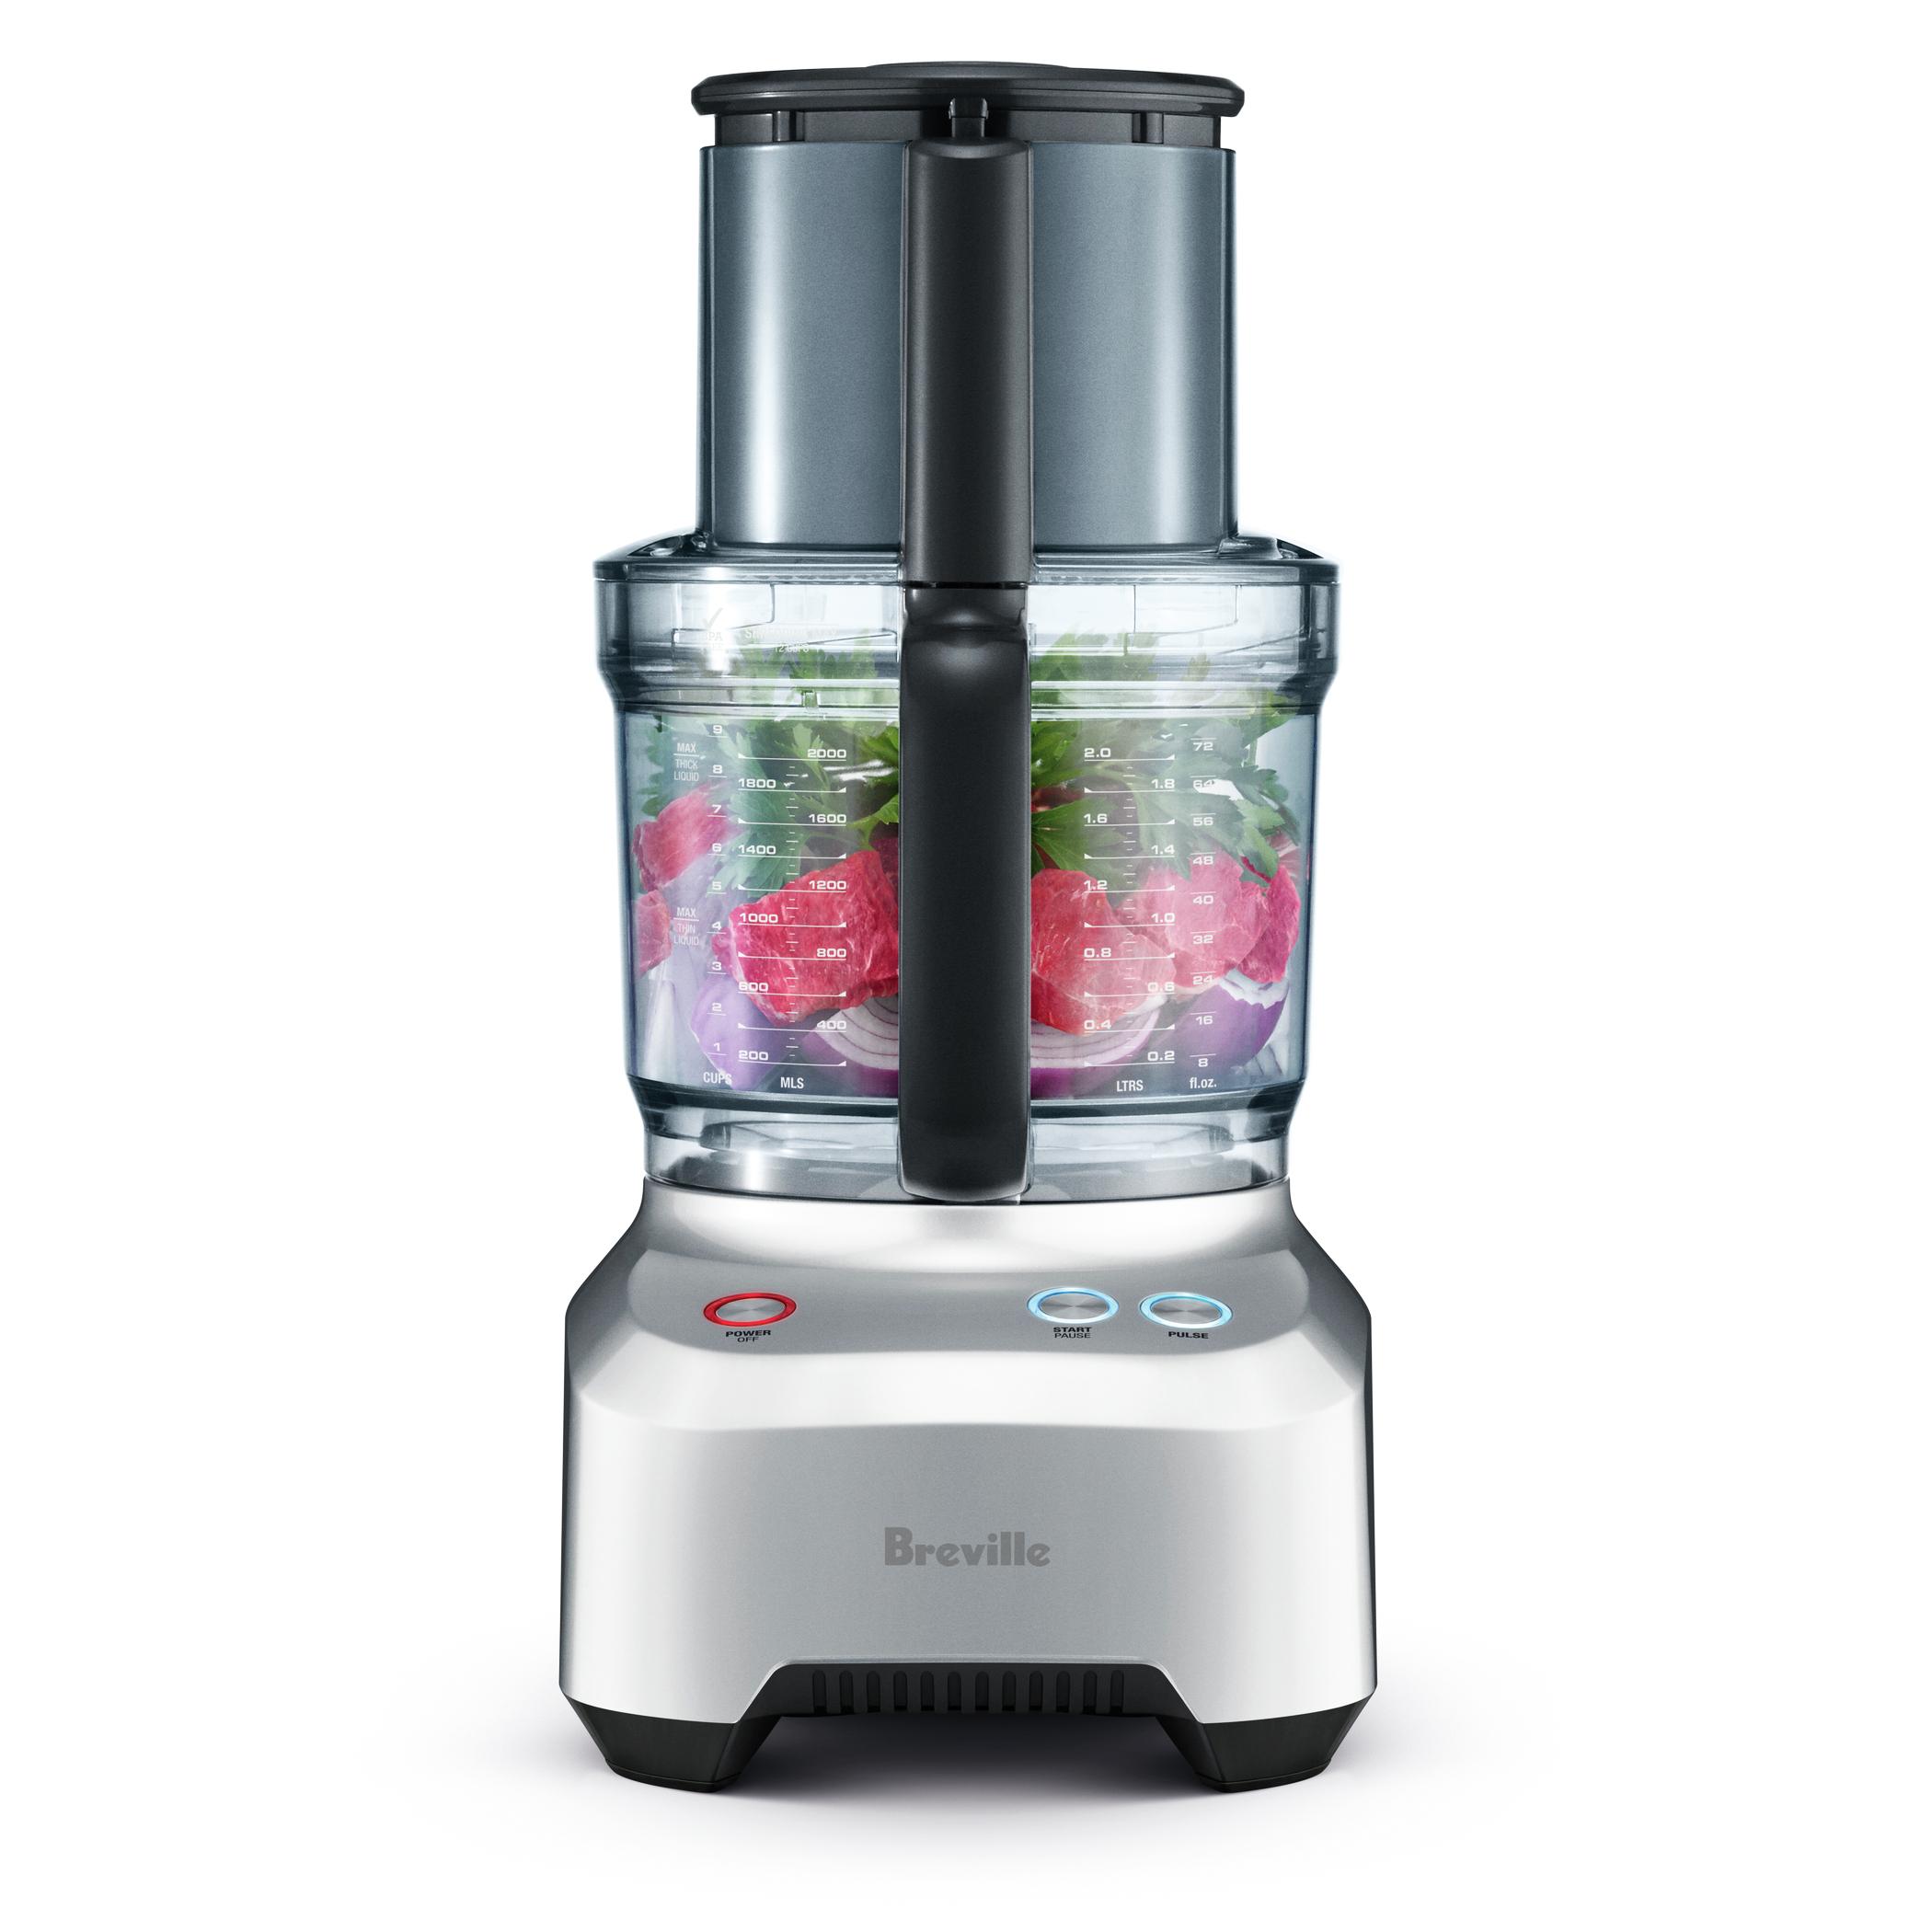 Breville Sous Chef 12 Cup Adjustable Food Processor